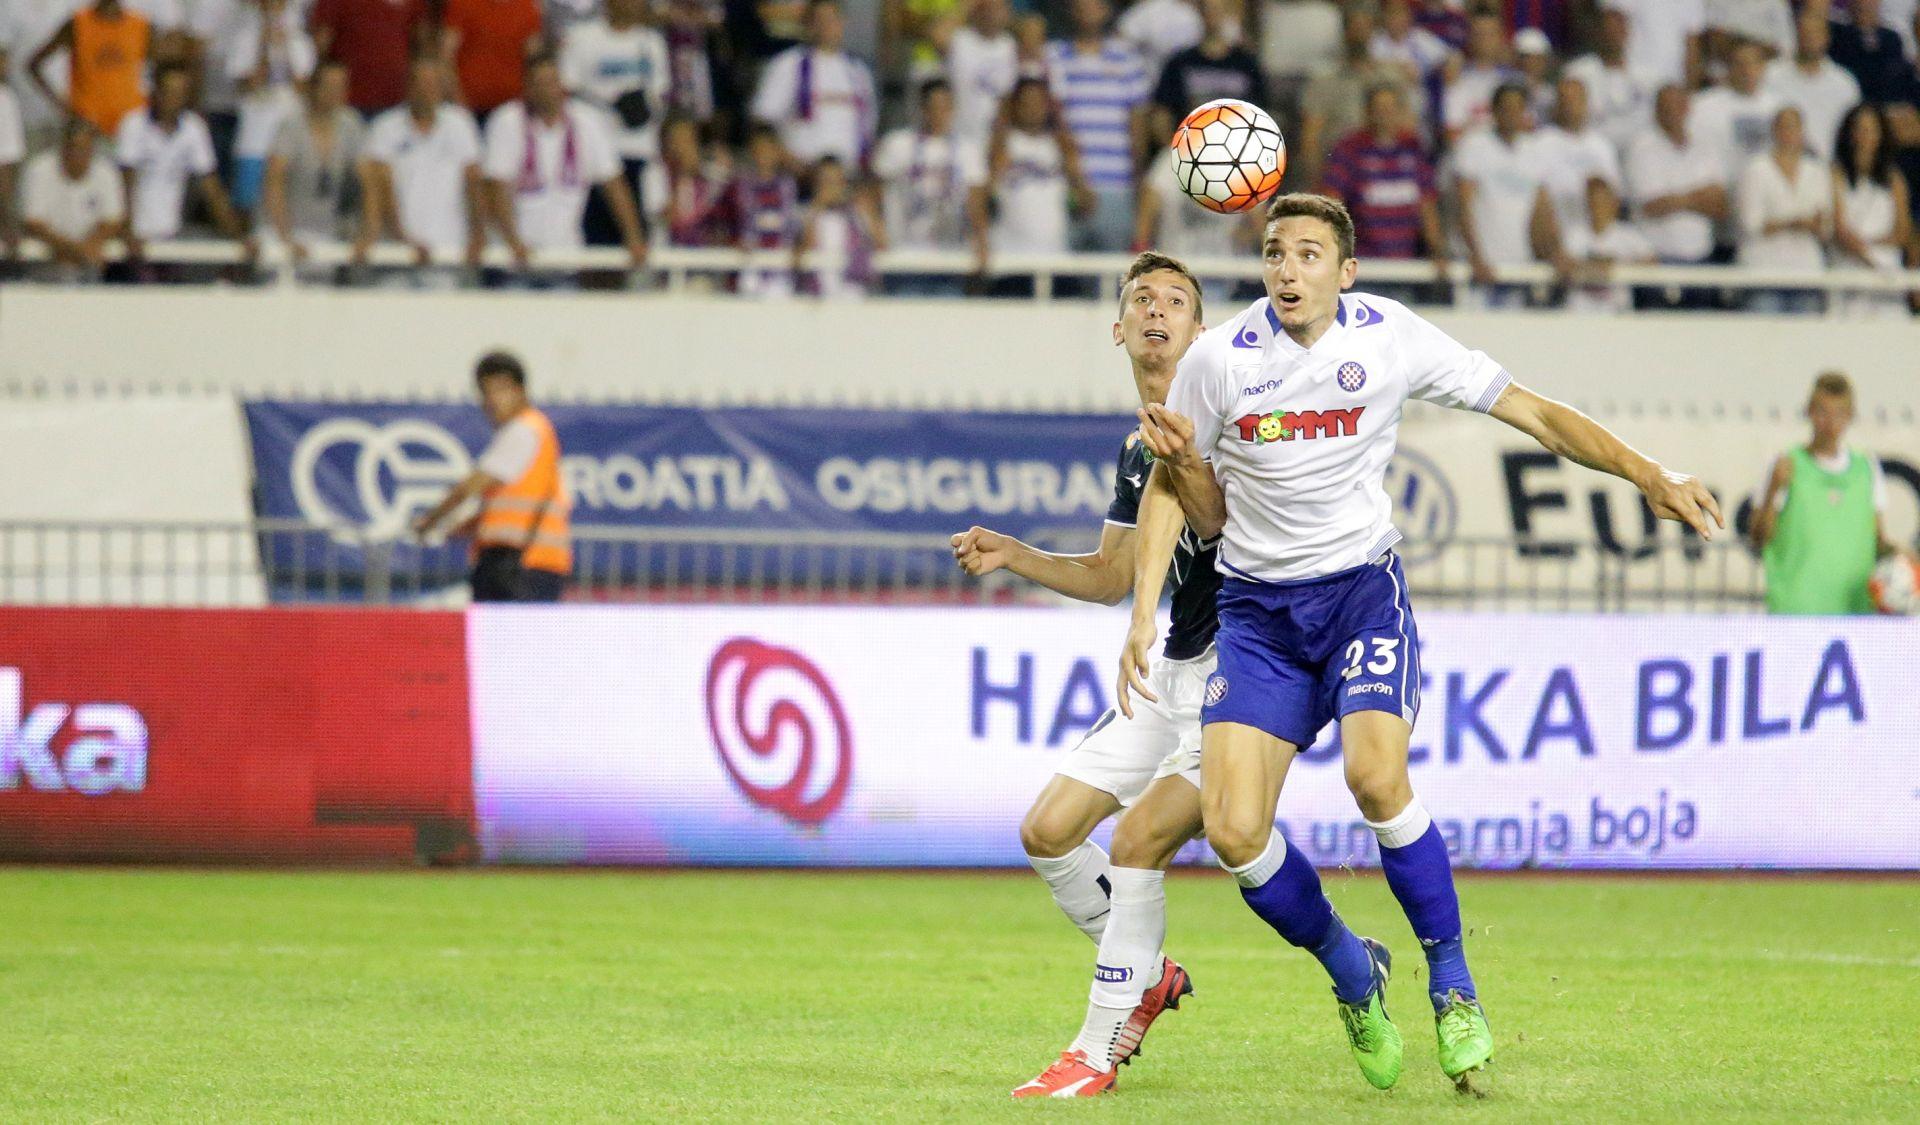 POLJUD NA NOGAMA Hajduk s dva gola otvorio vrata Europe